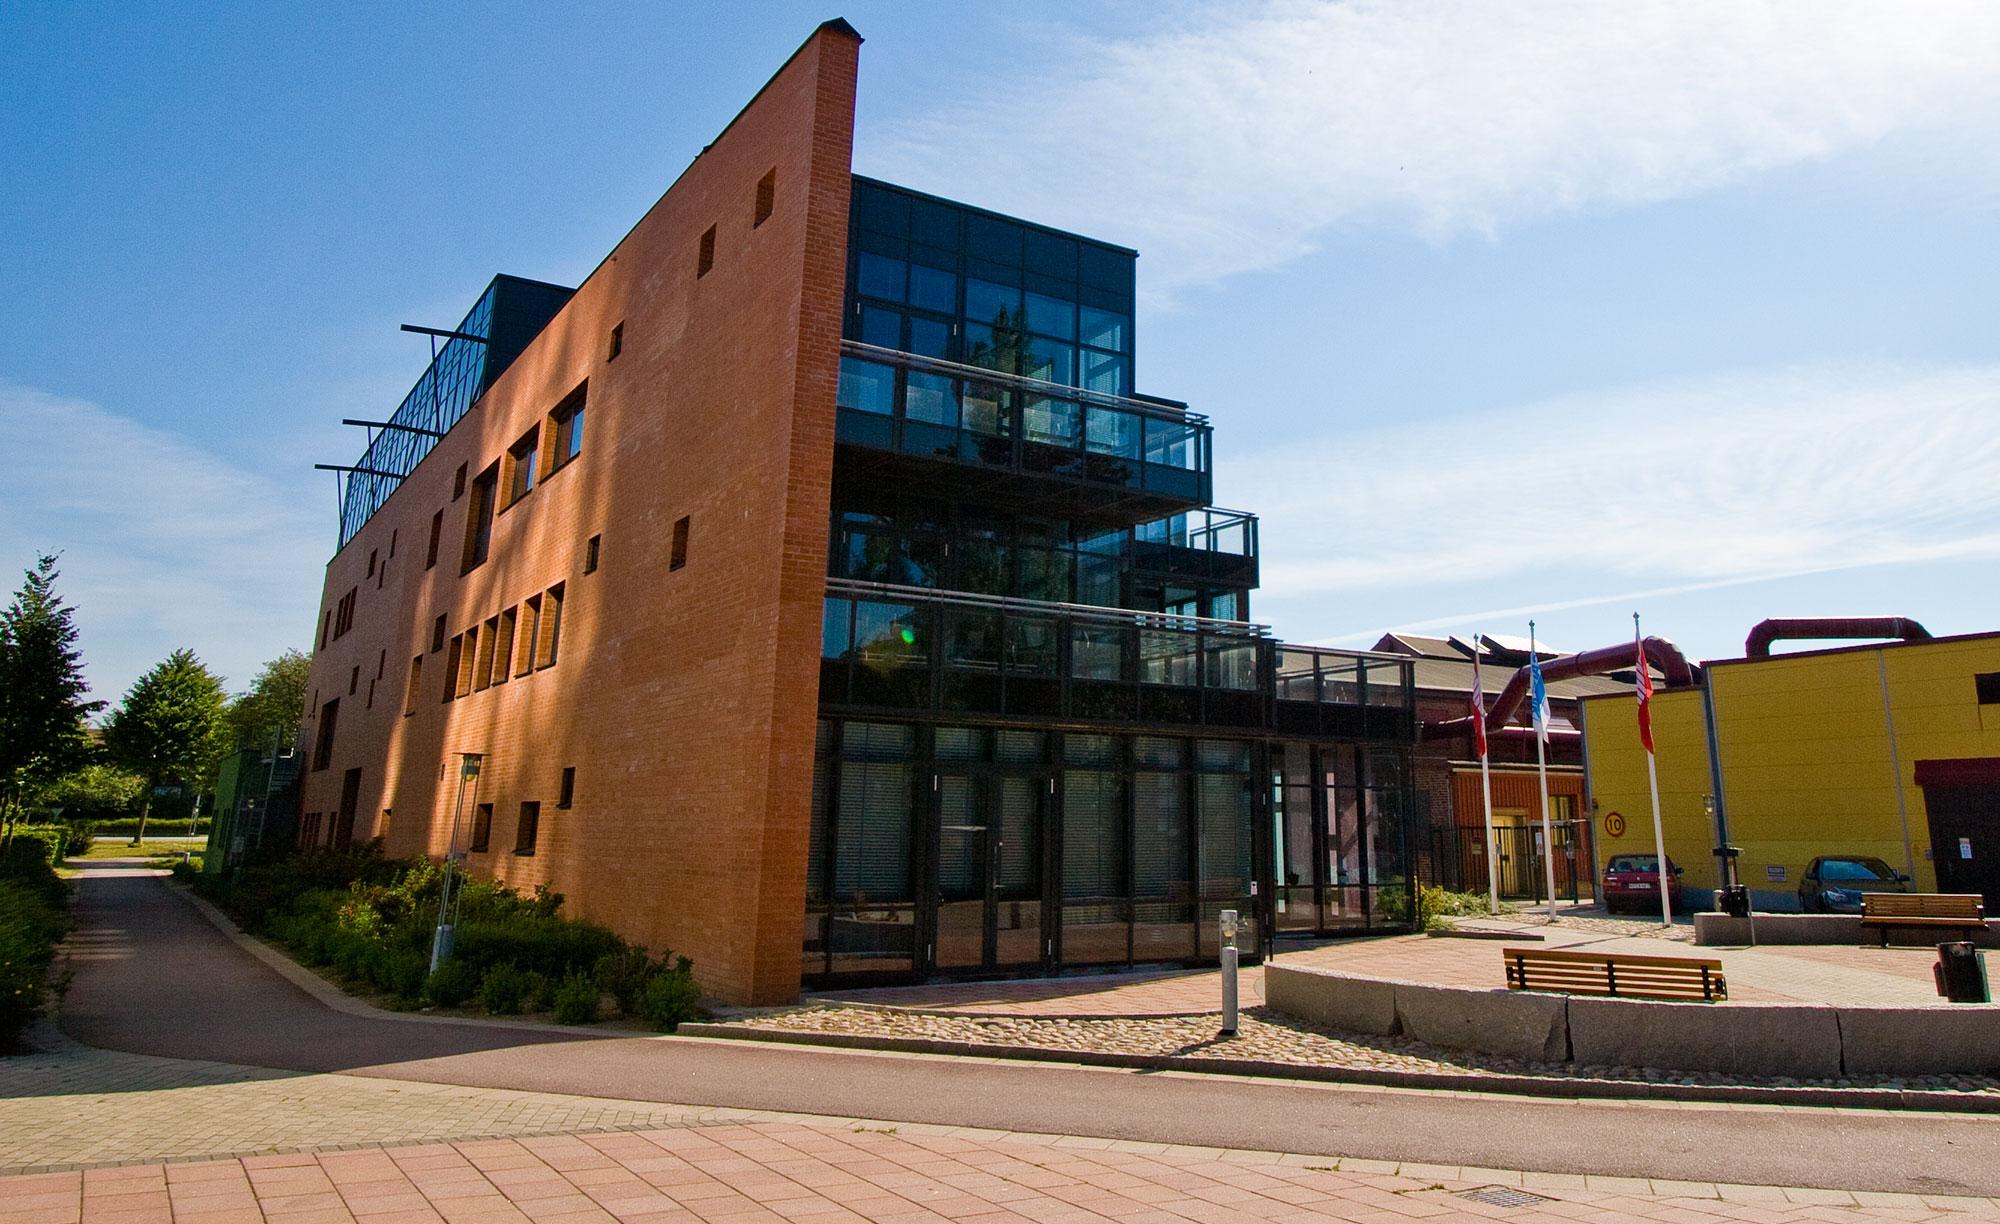 Kontorshuset KB Svarta Diamanten - Halmstad